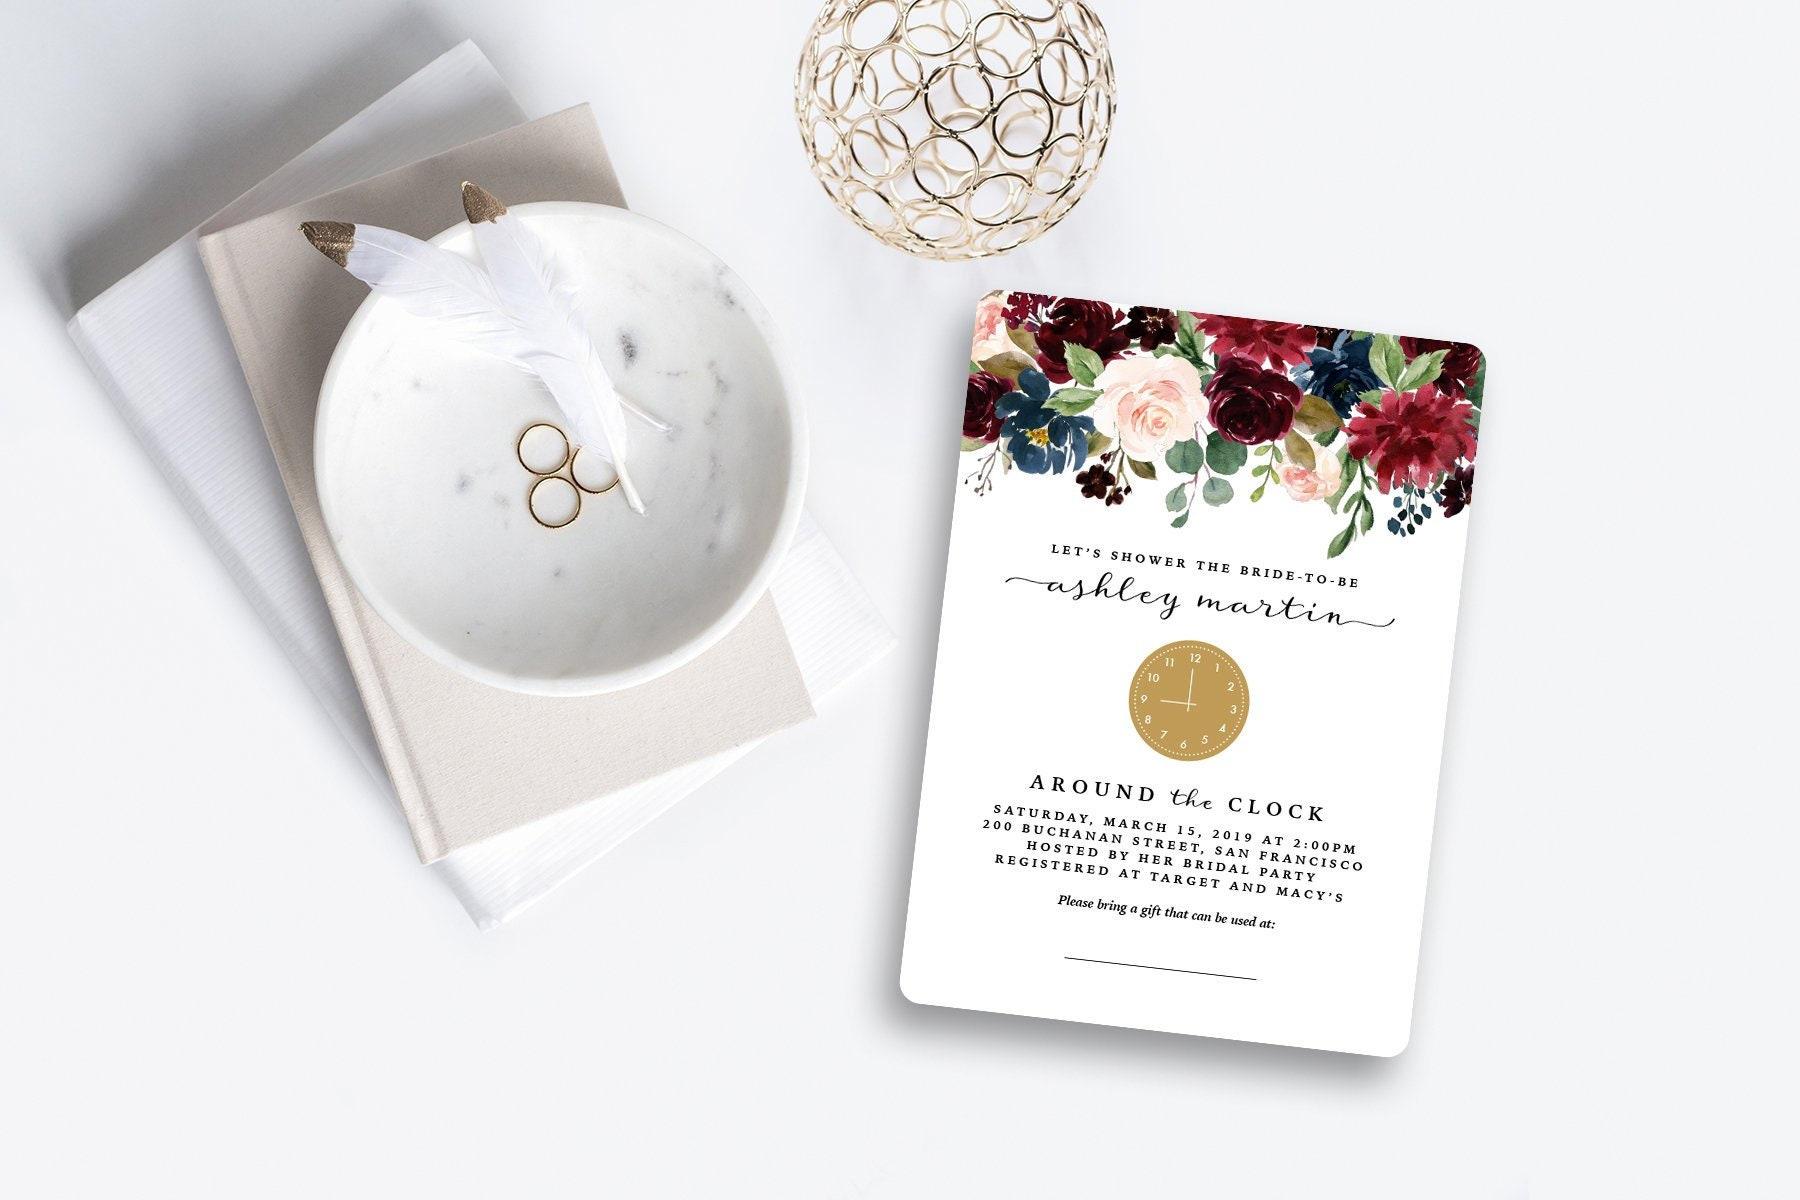 Around the Clock Bridal Shower Invitation Floral Marsala | Etsy